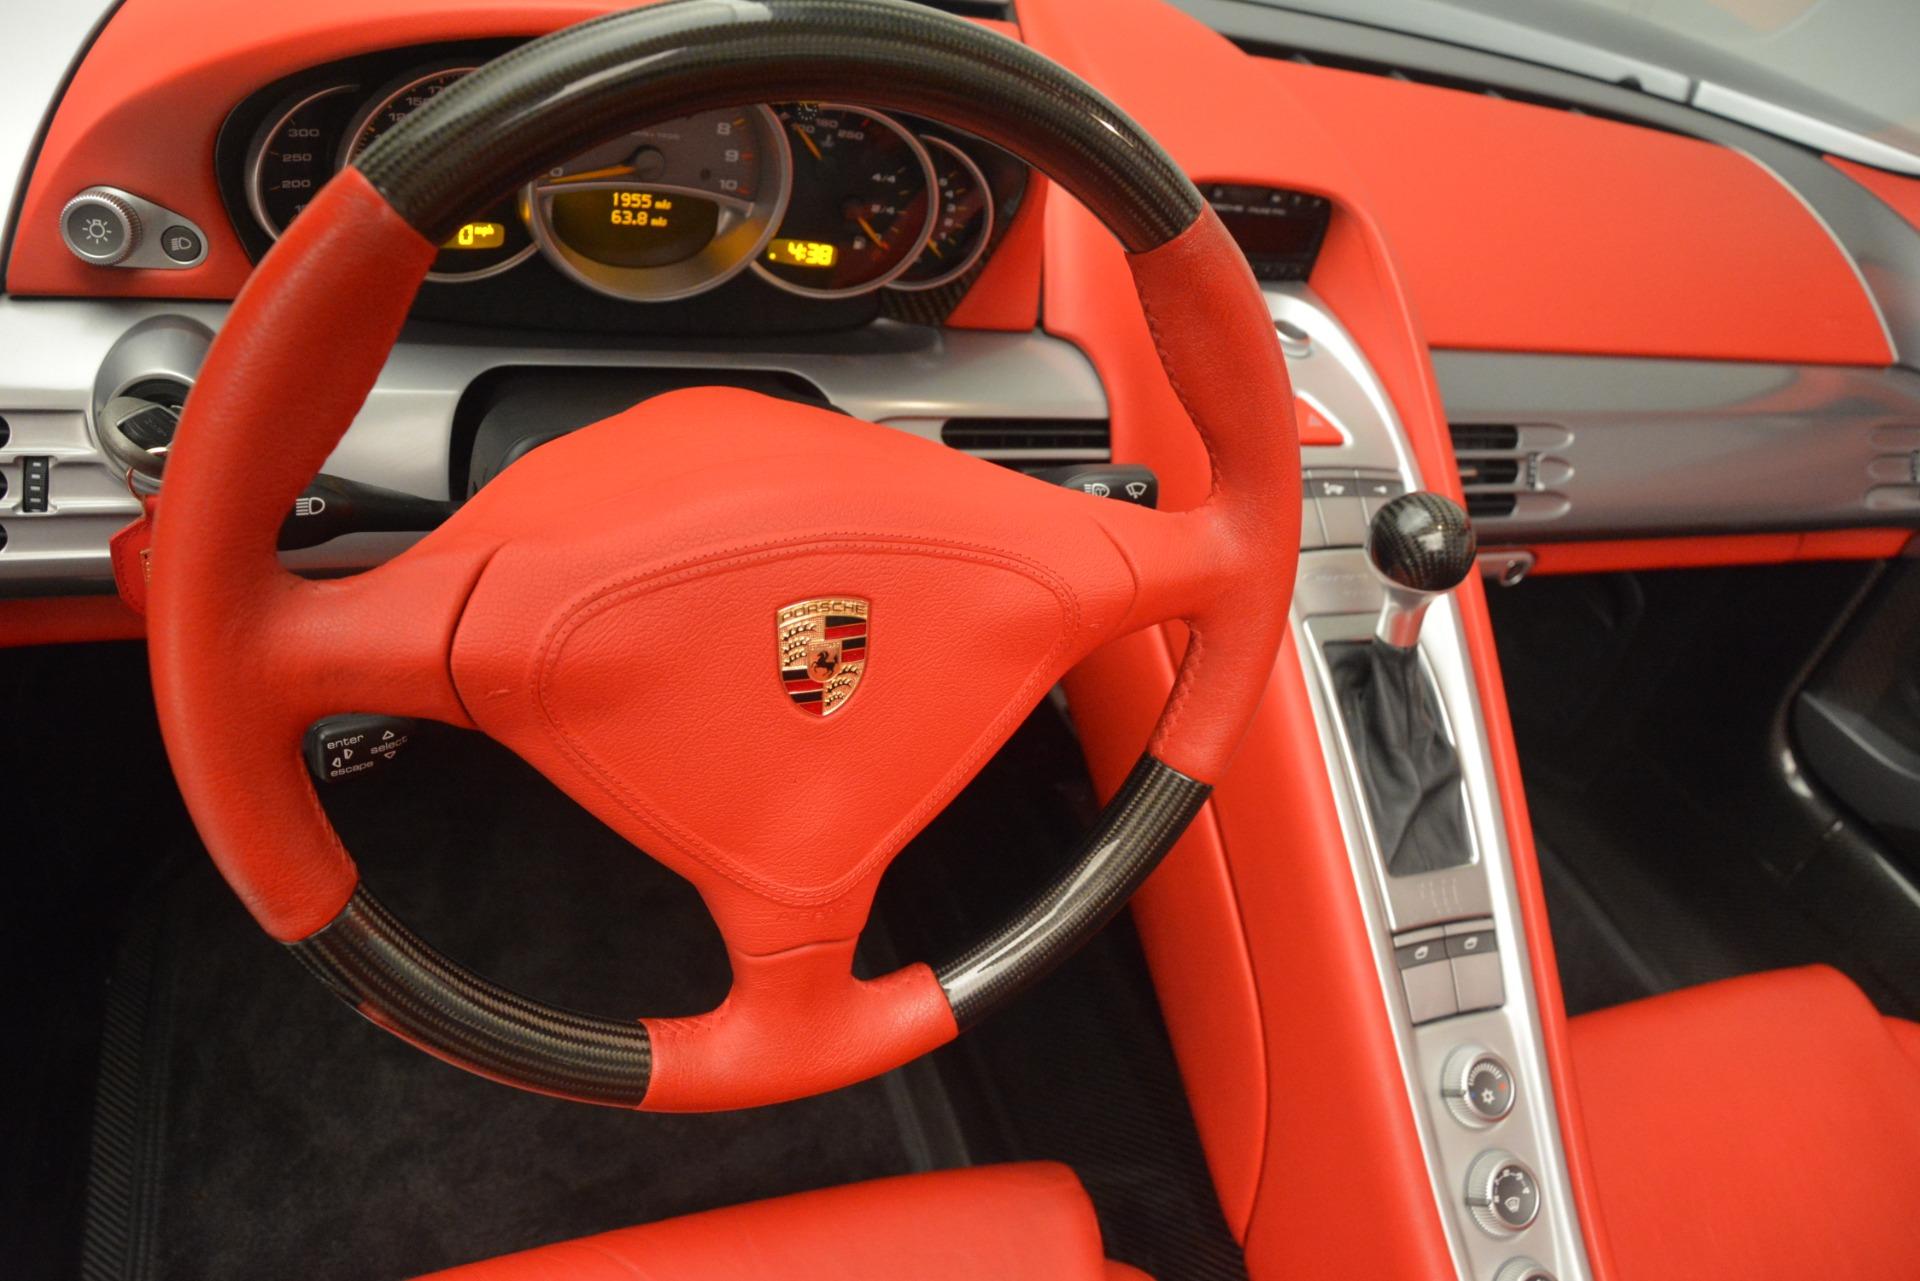 Used 2005 Porsche Carrera GT  For Sale In Greenwich, CT 3161_p27